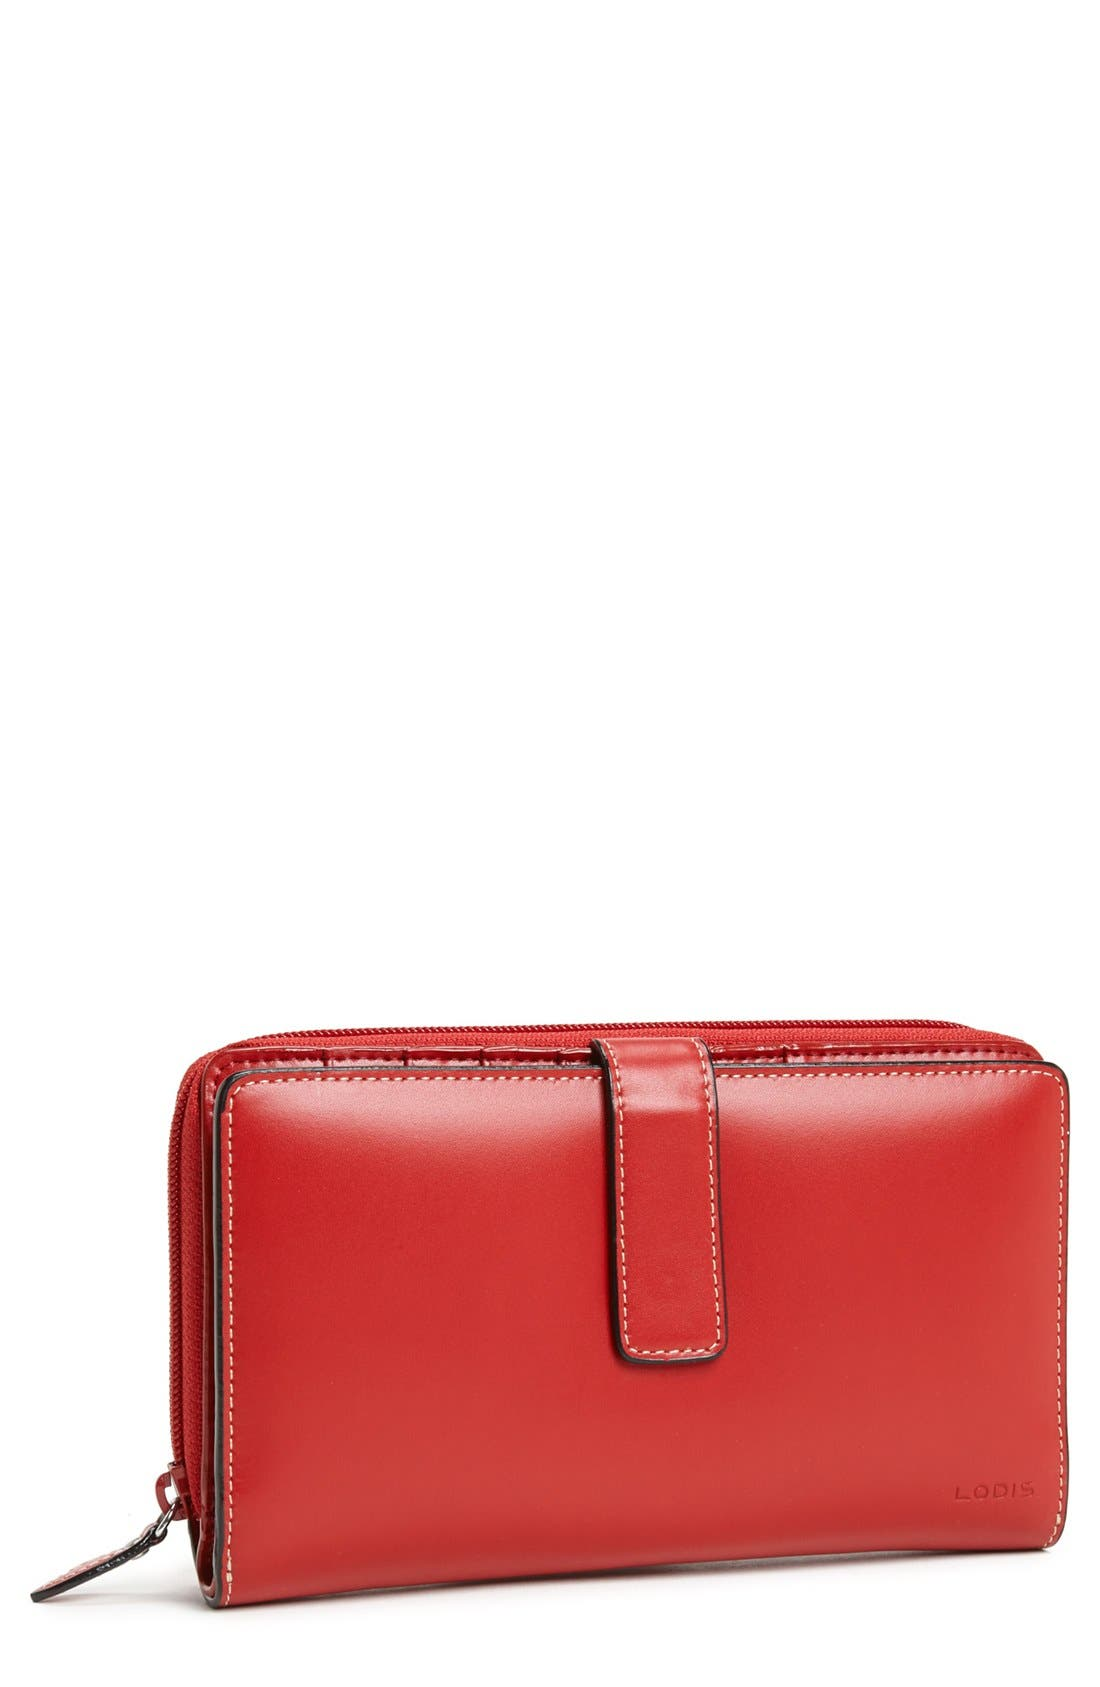 Main Image - Lodis 'Audrey - Deluxe' Checkbook Clutch Wallet